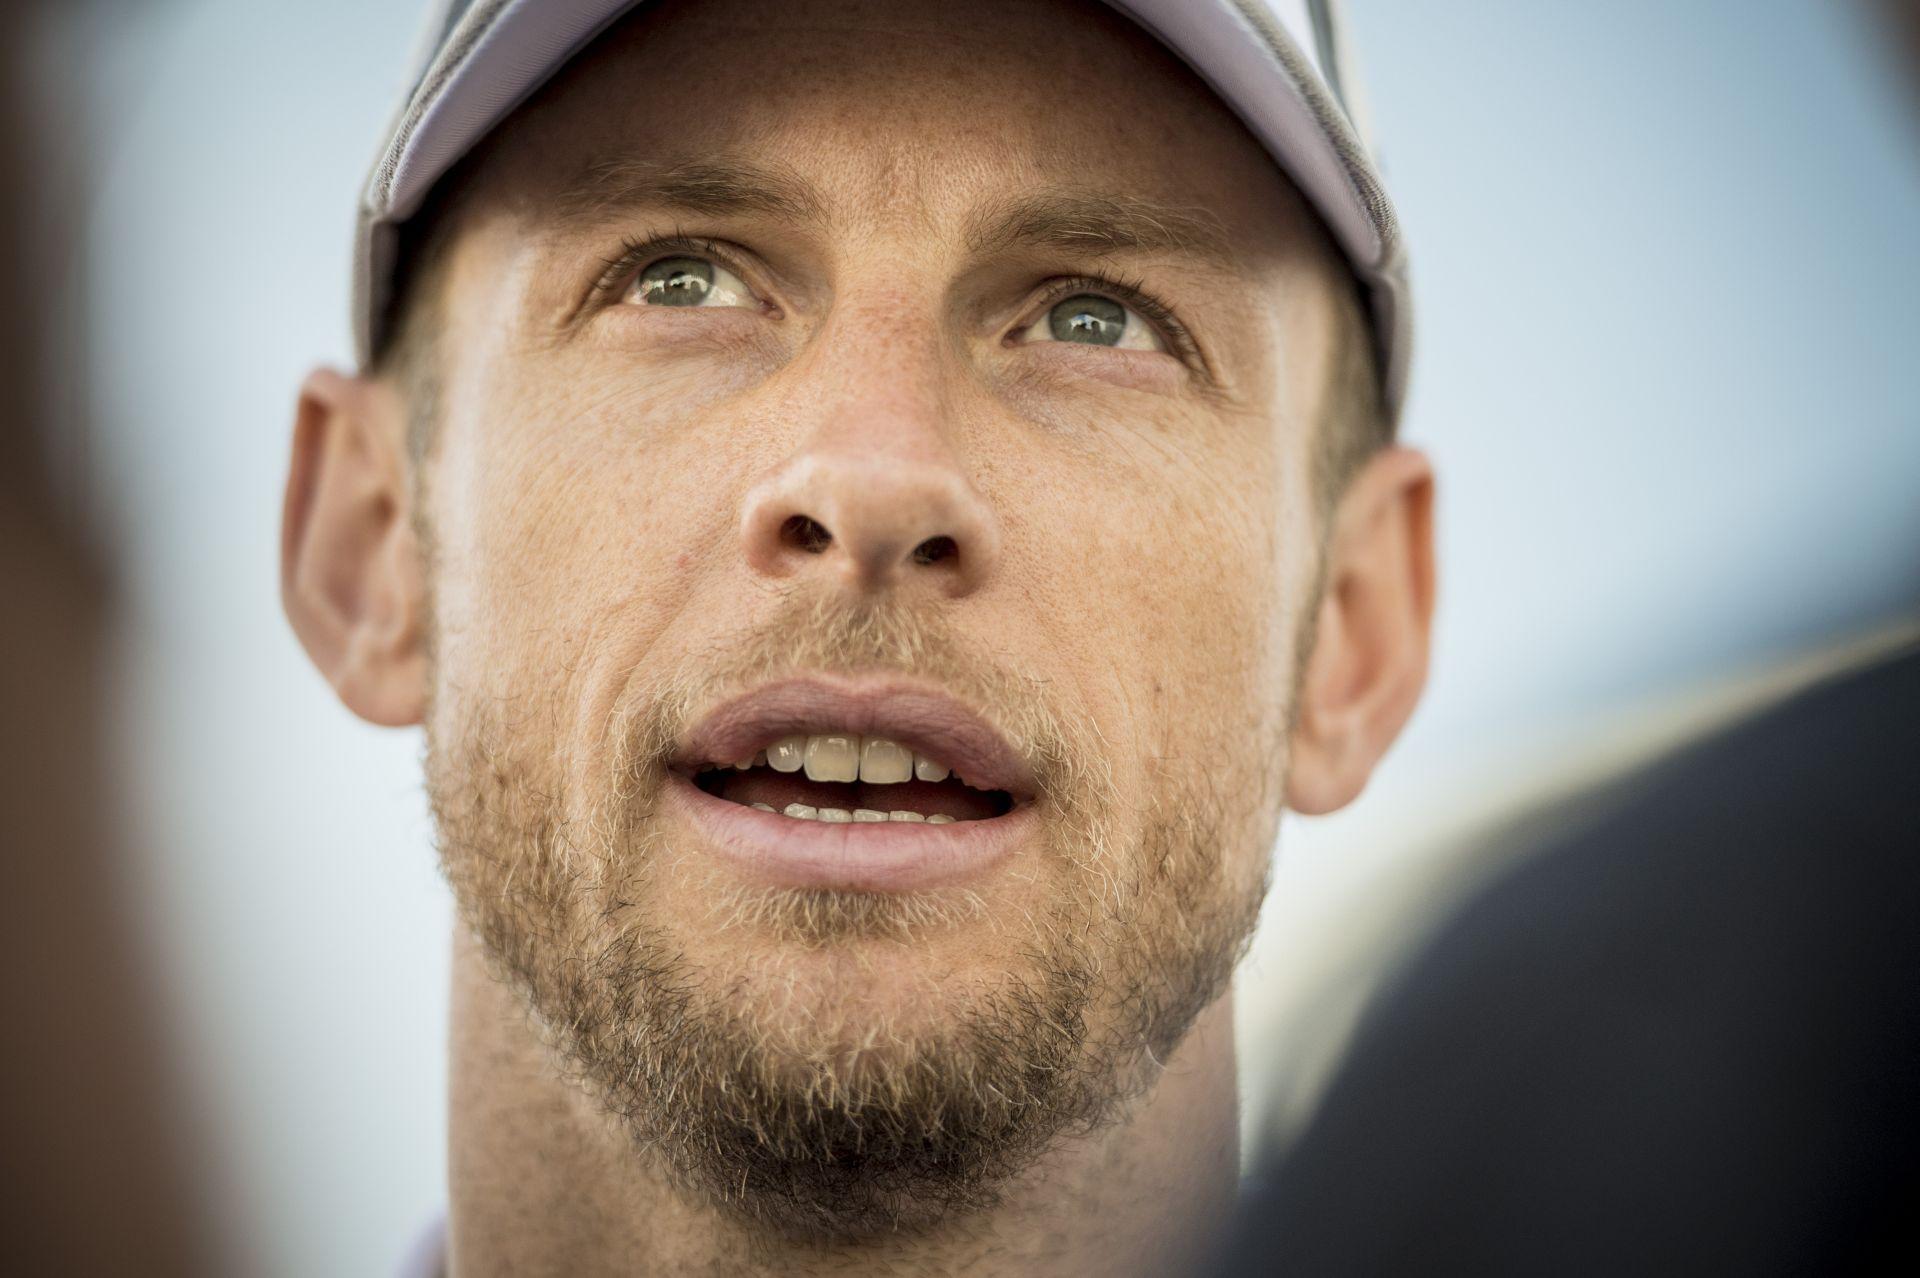 McLaren: Button in, Magnussen out